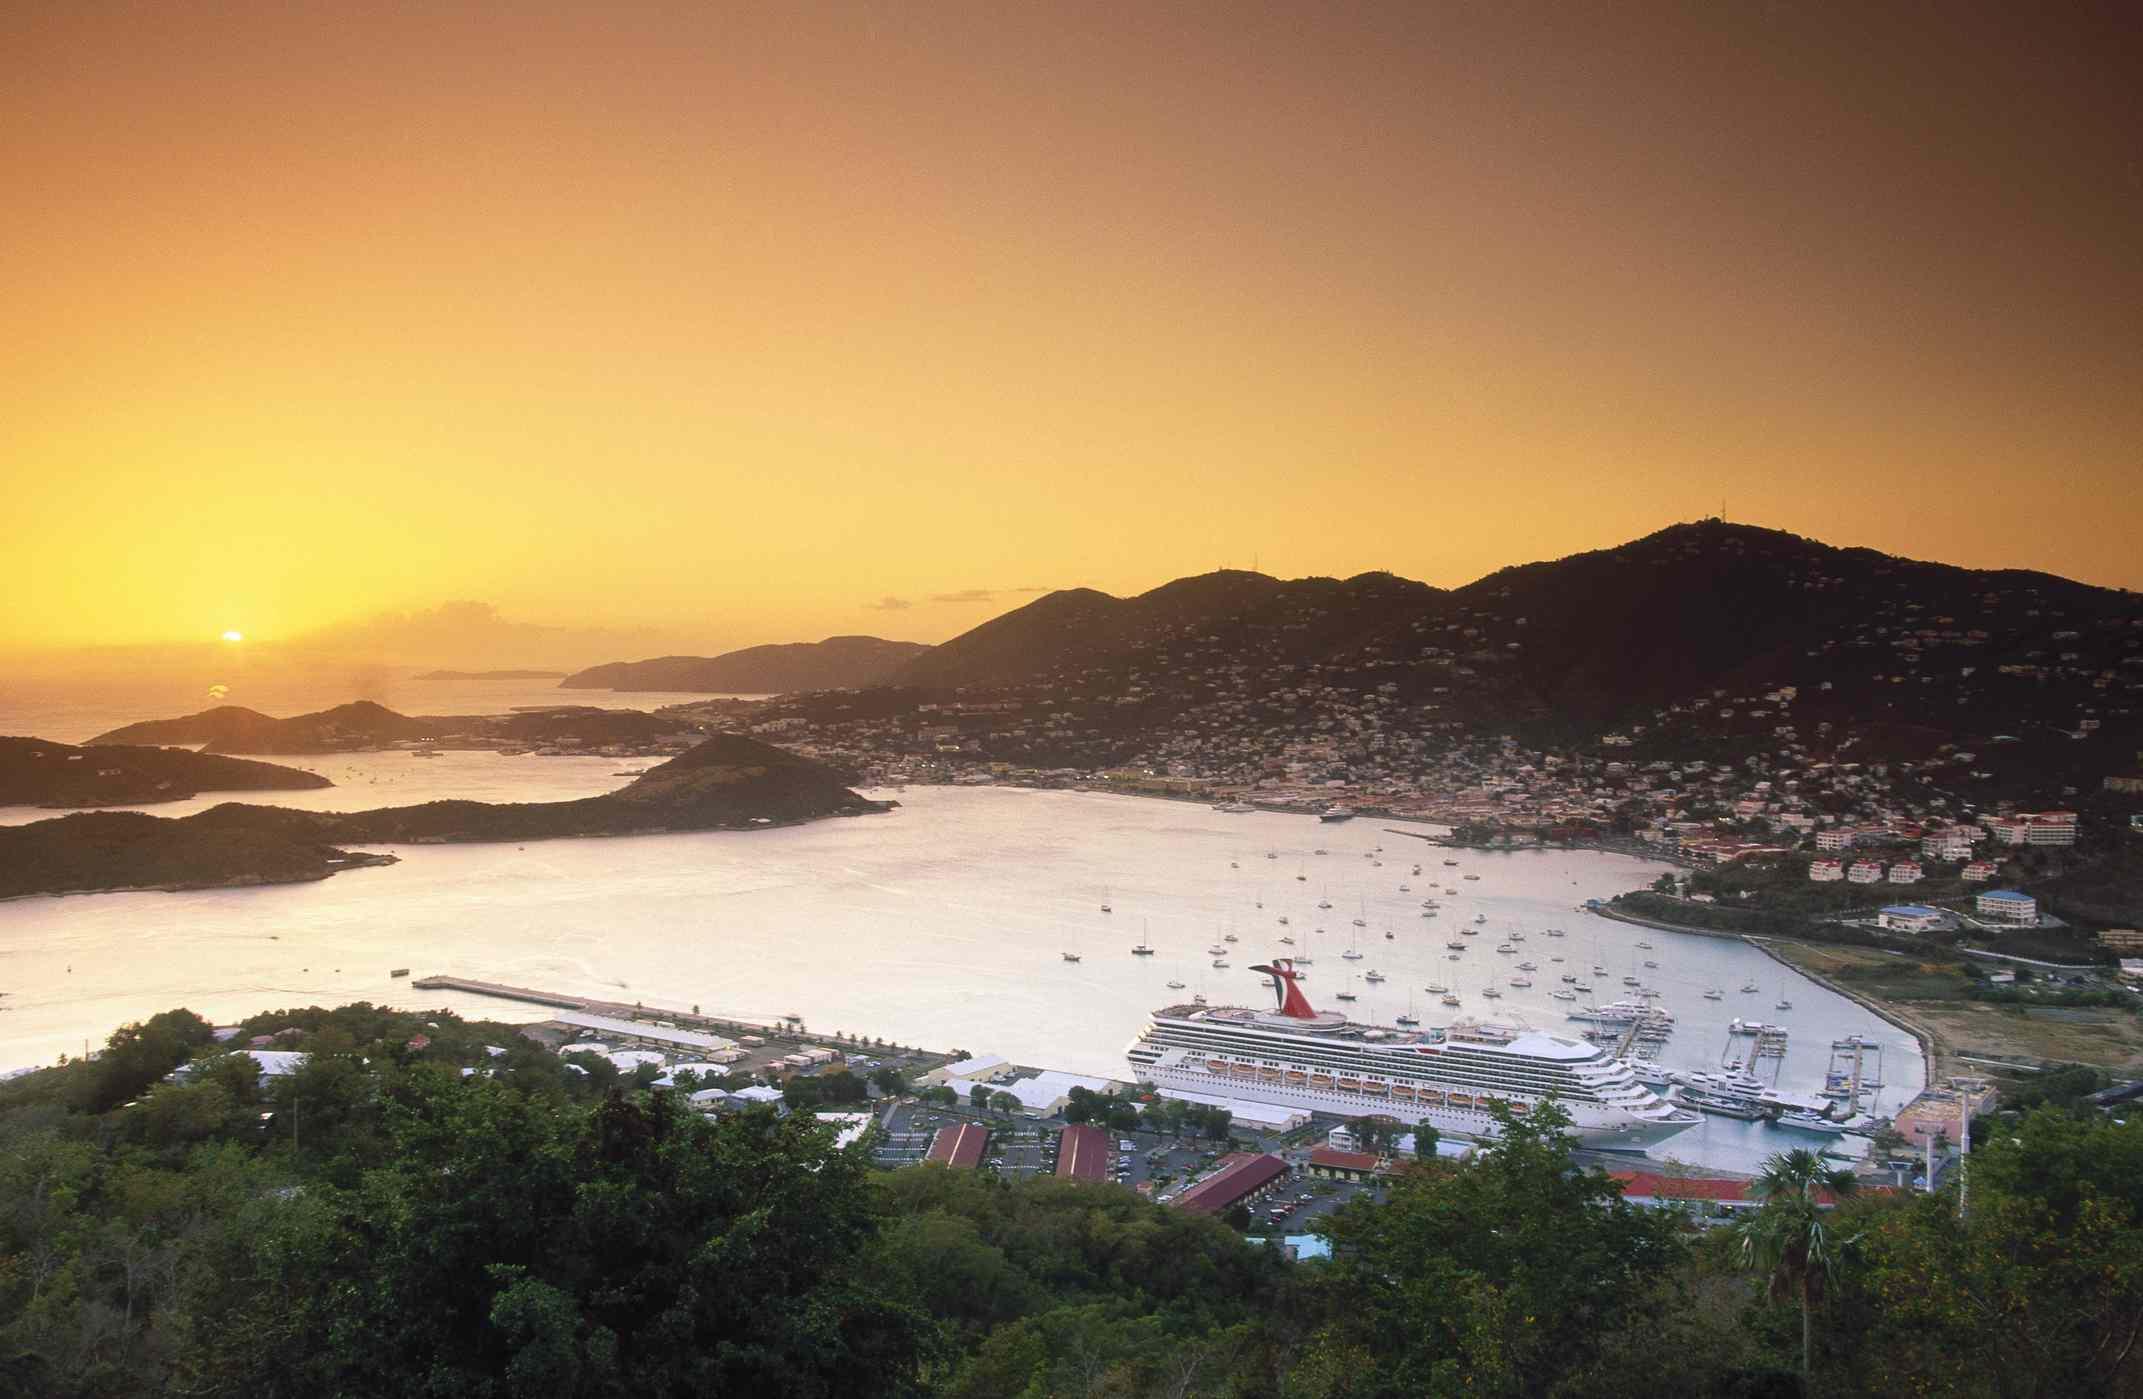 St. Thomas sunset in the harbor of Charlotte Amalie